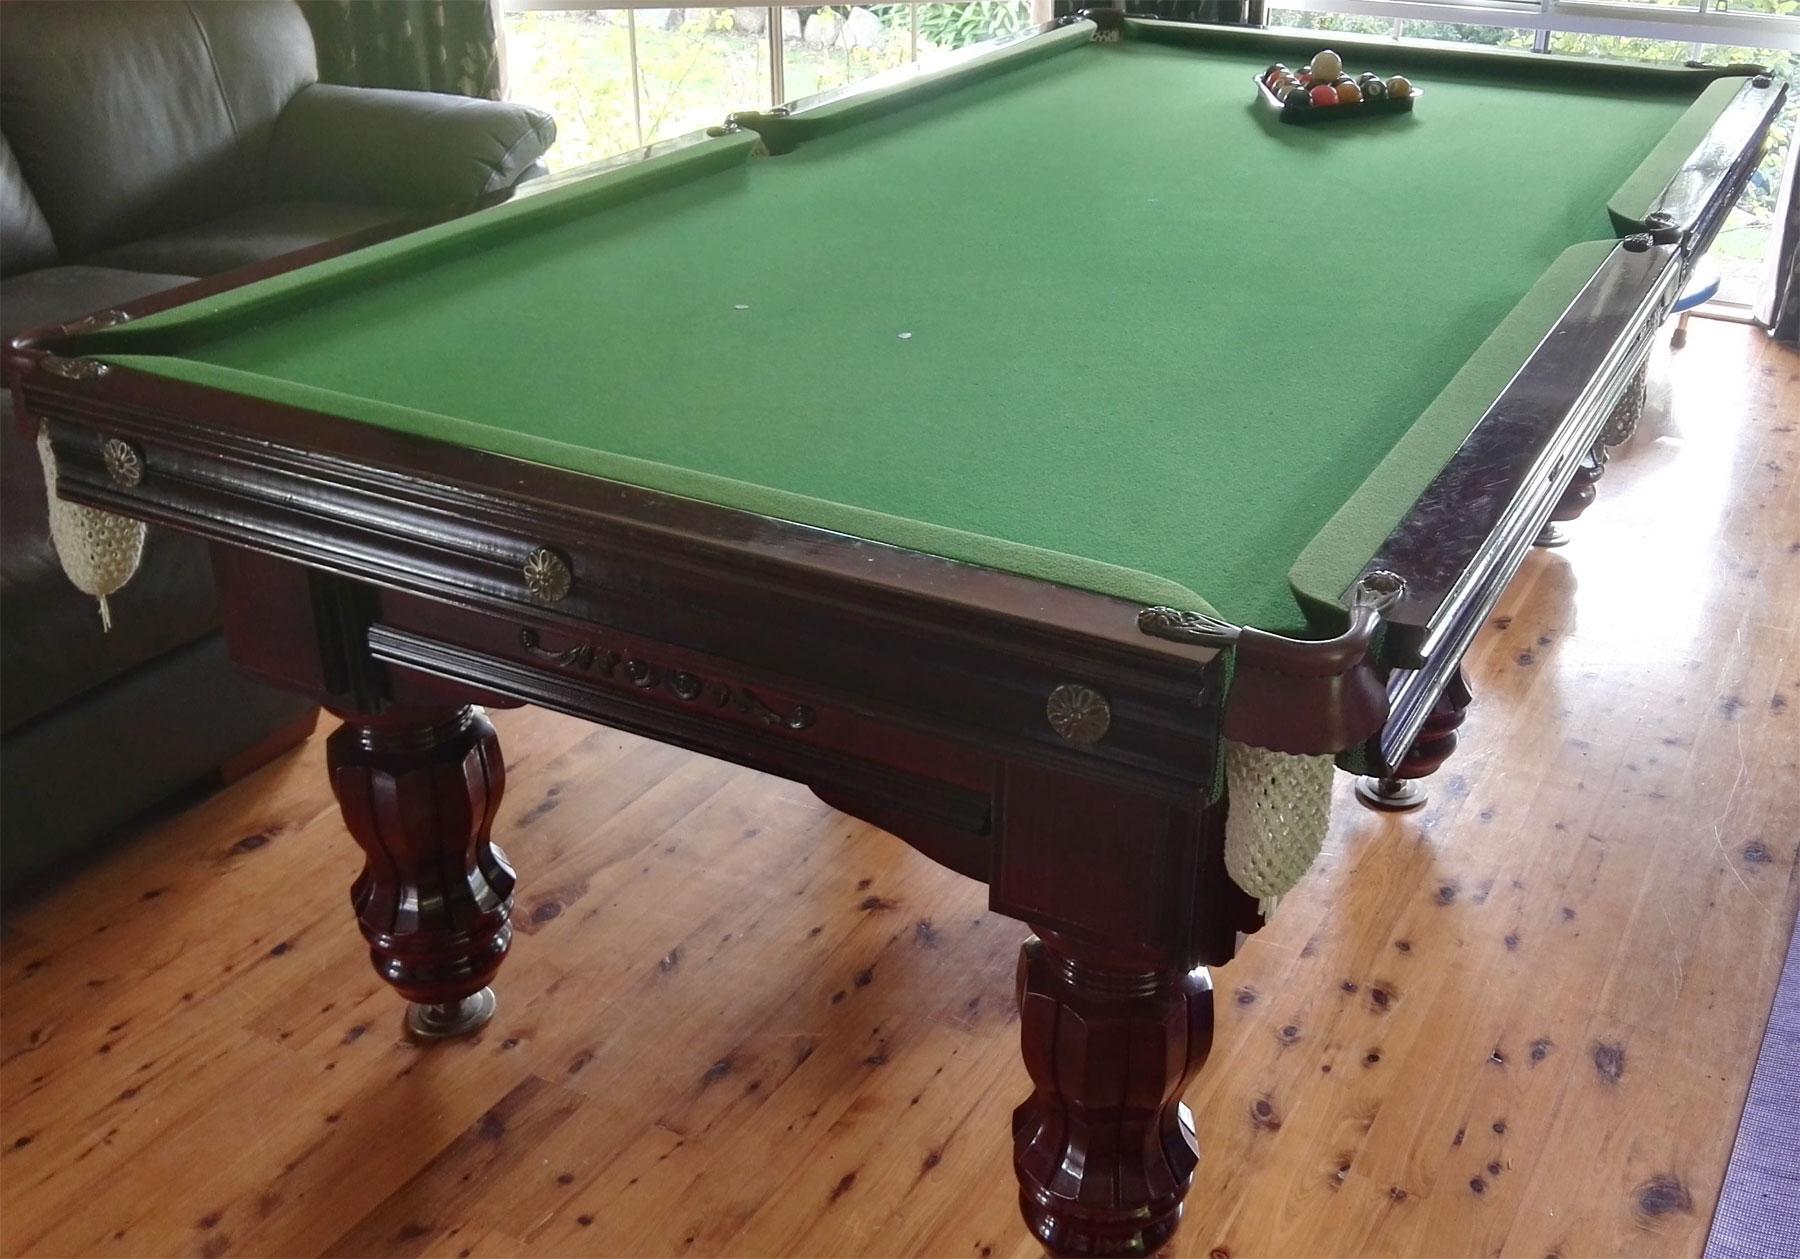 X Pool Table Make Identification - Pool table identification